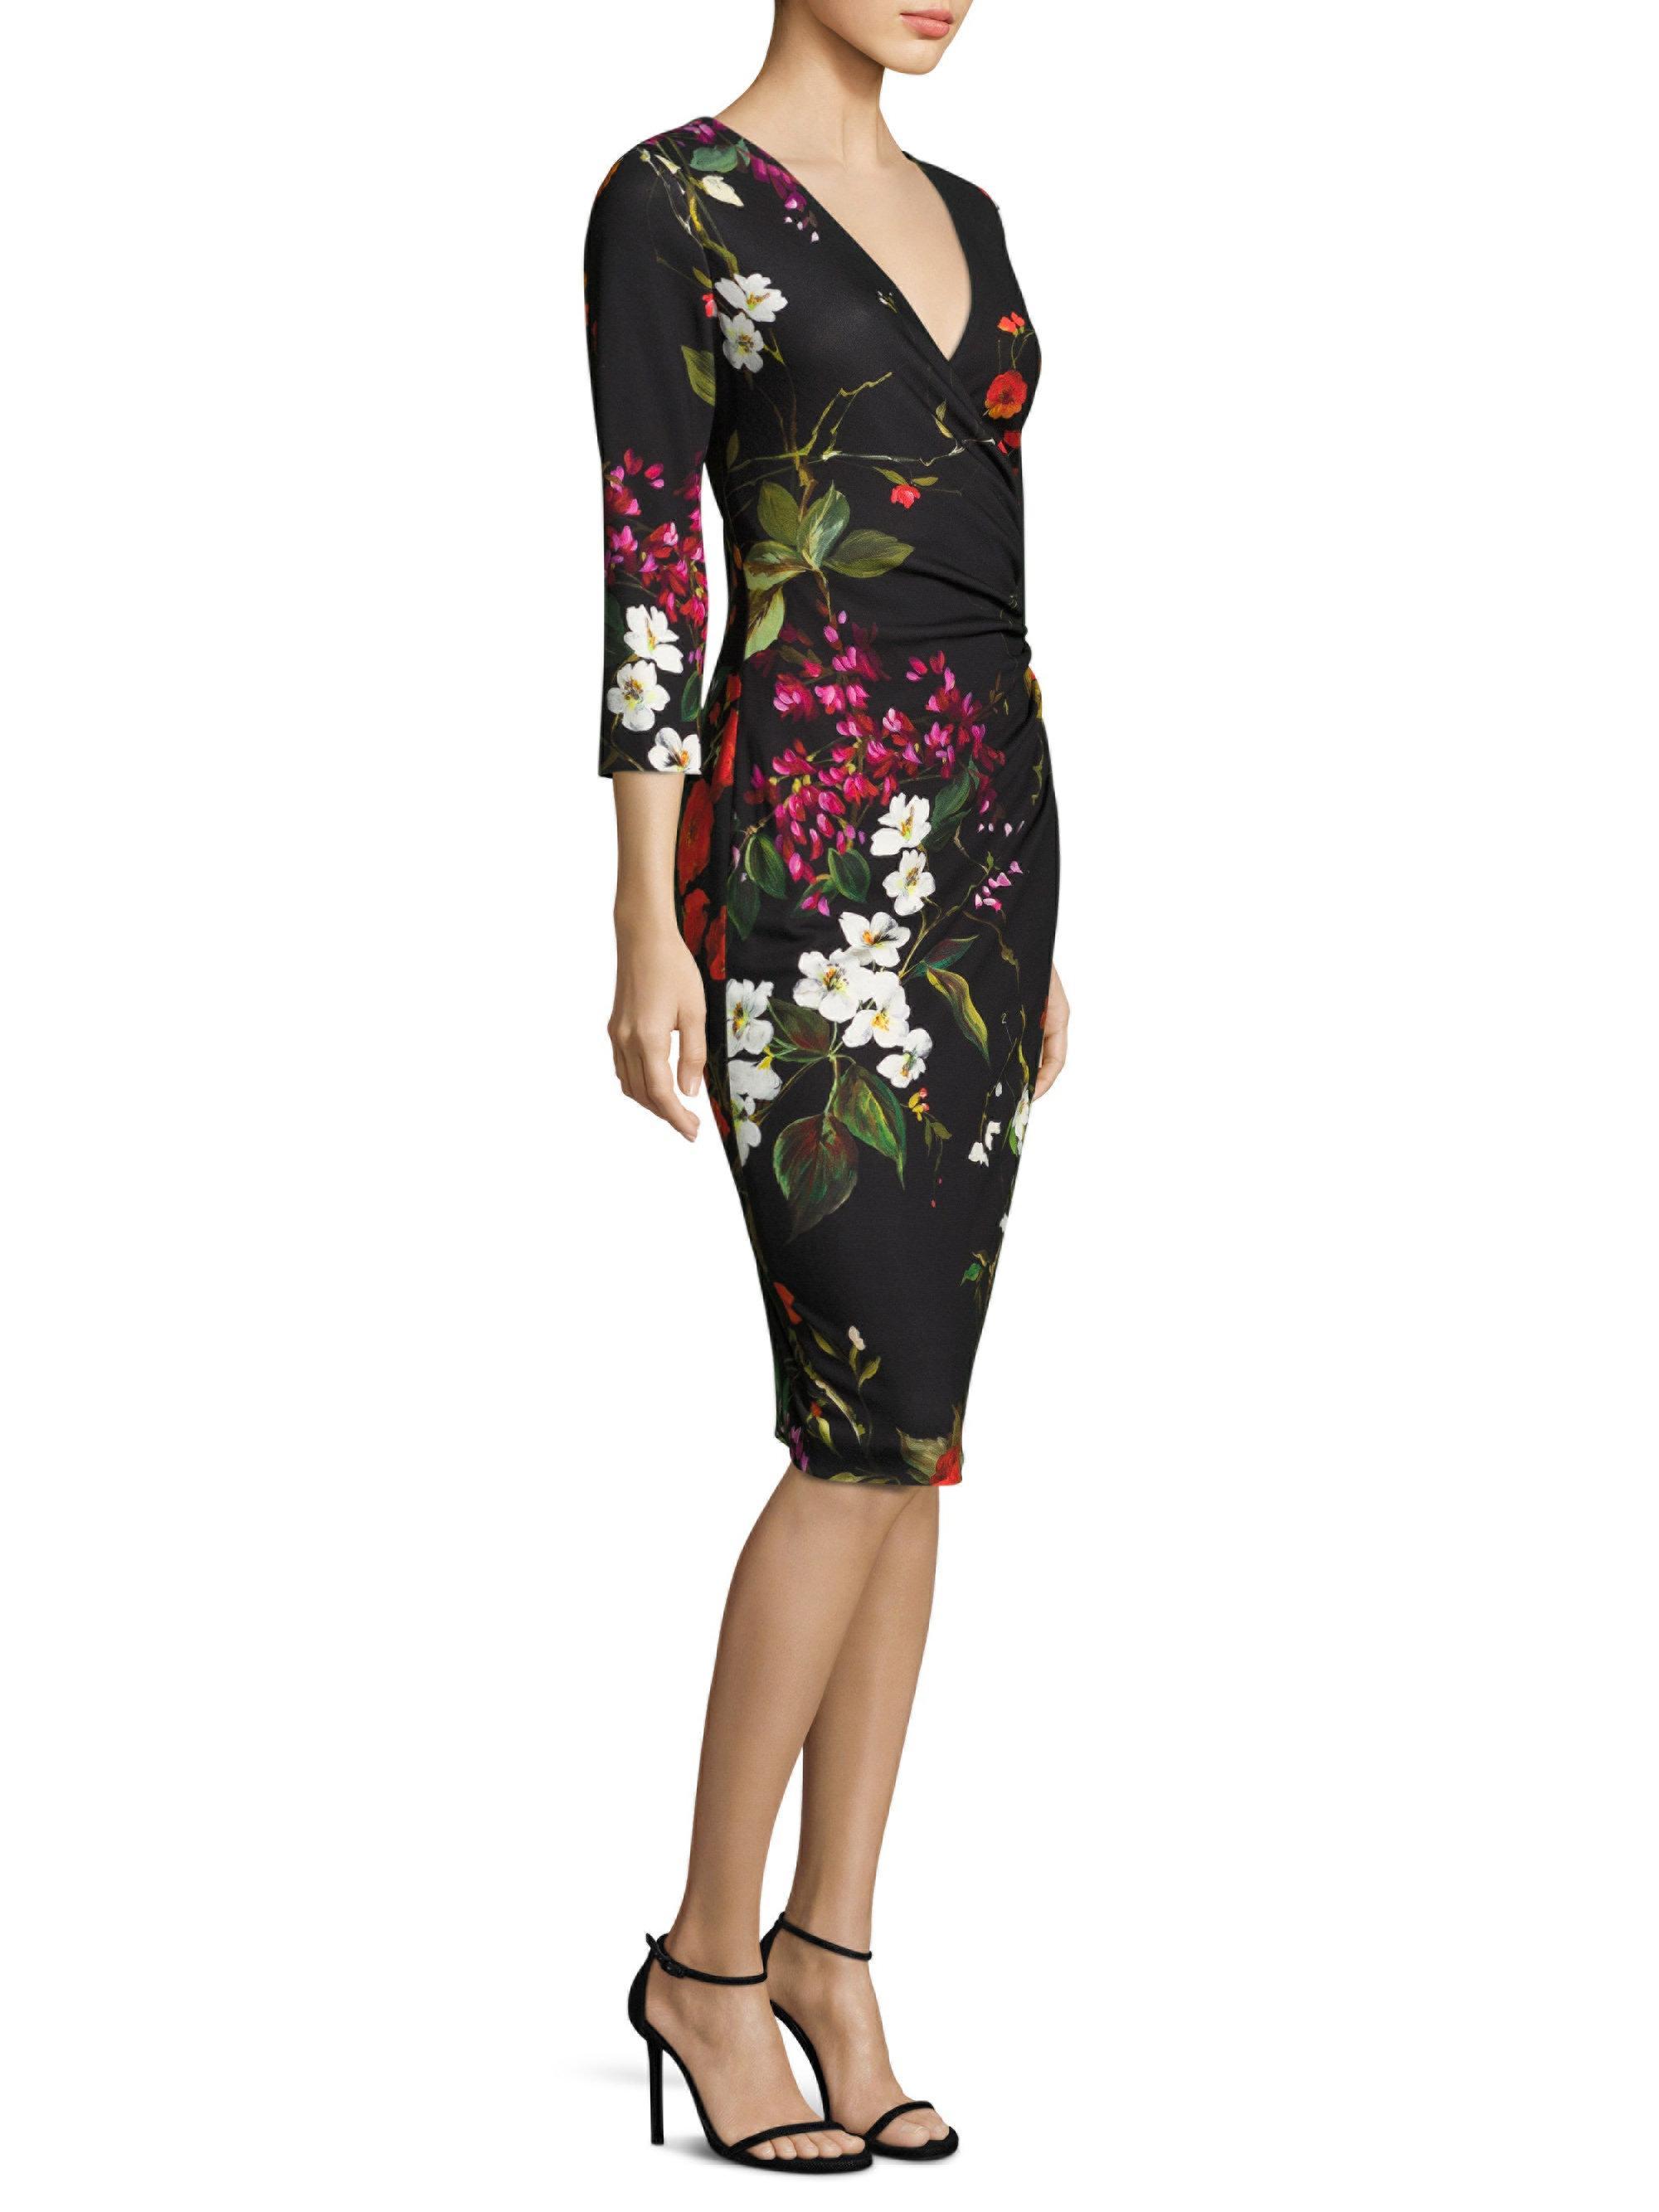 441f441c109b Lyst - ESCADA Dimolas Floral-print Jersey Faux-wrap Dress in Black